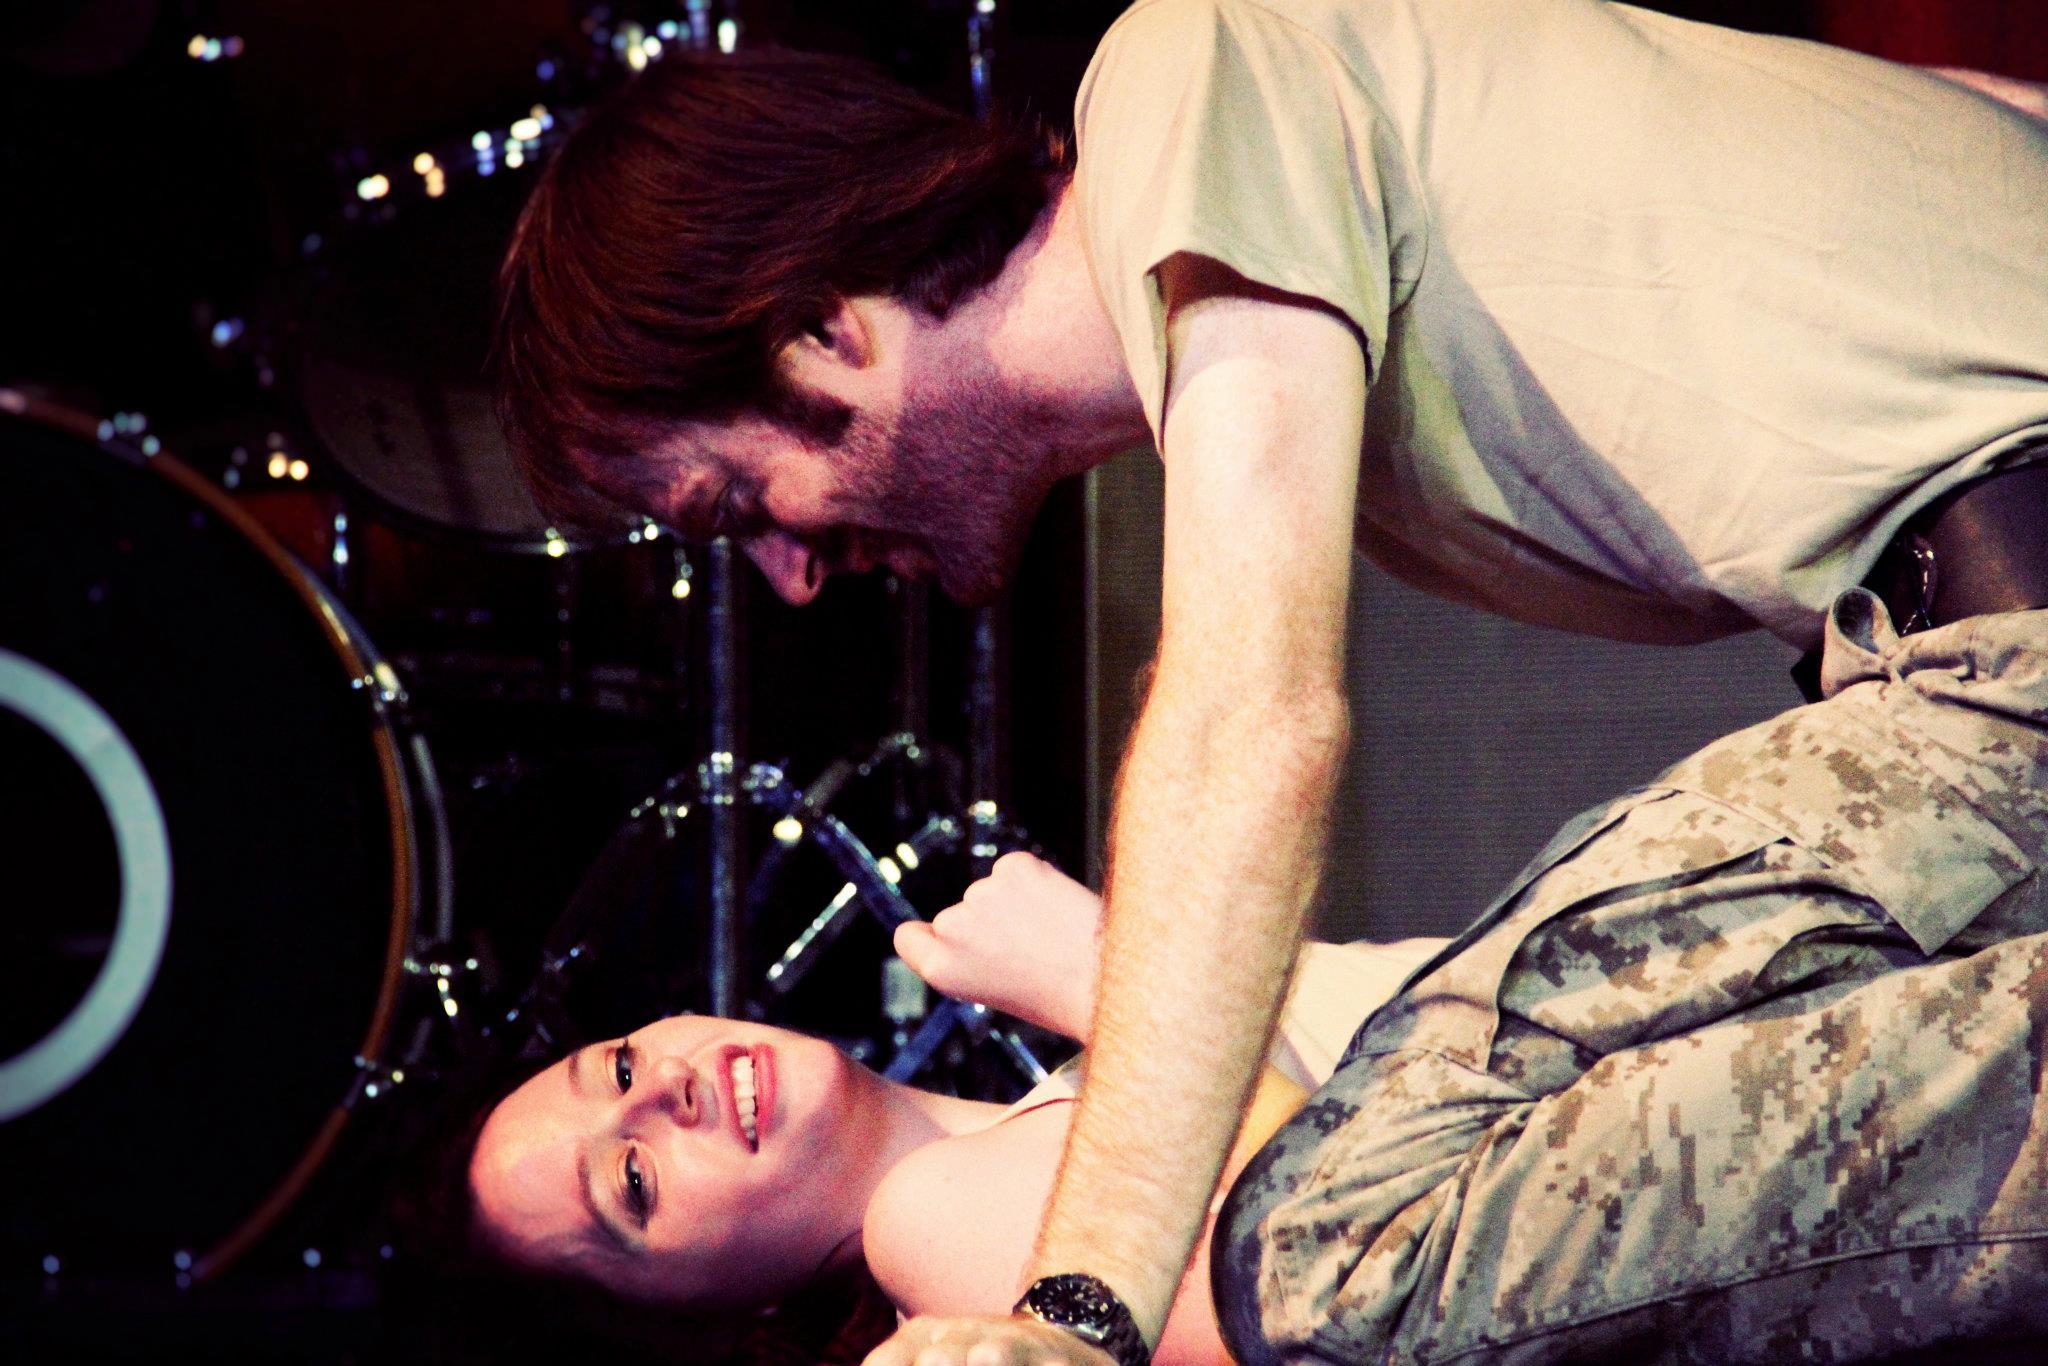 Cressida (Haley Cooper) and Diomedes (James Cooper)